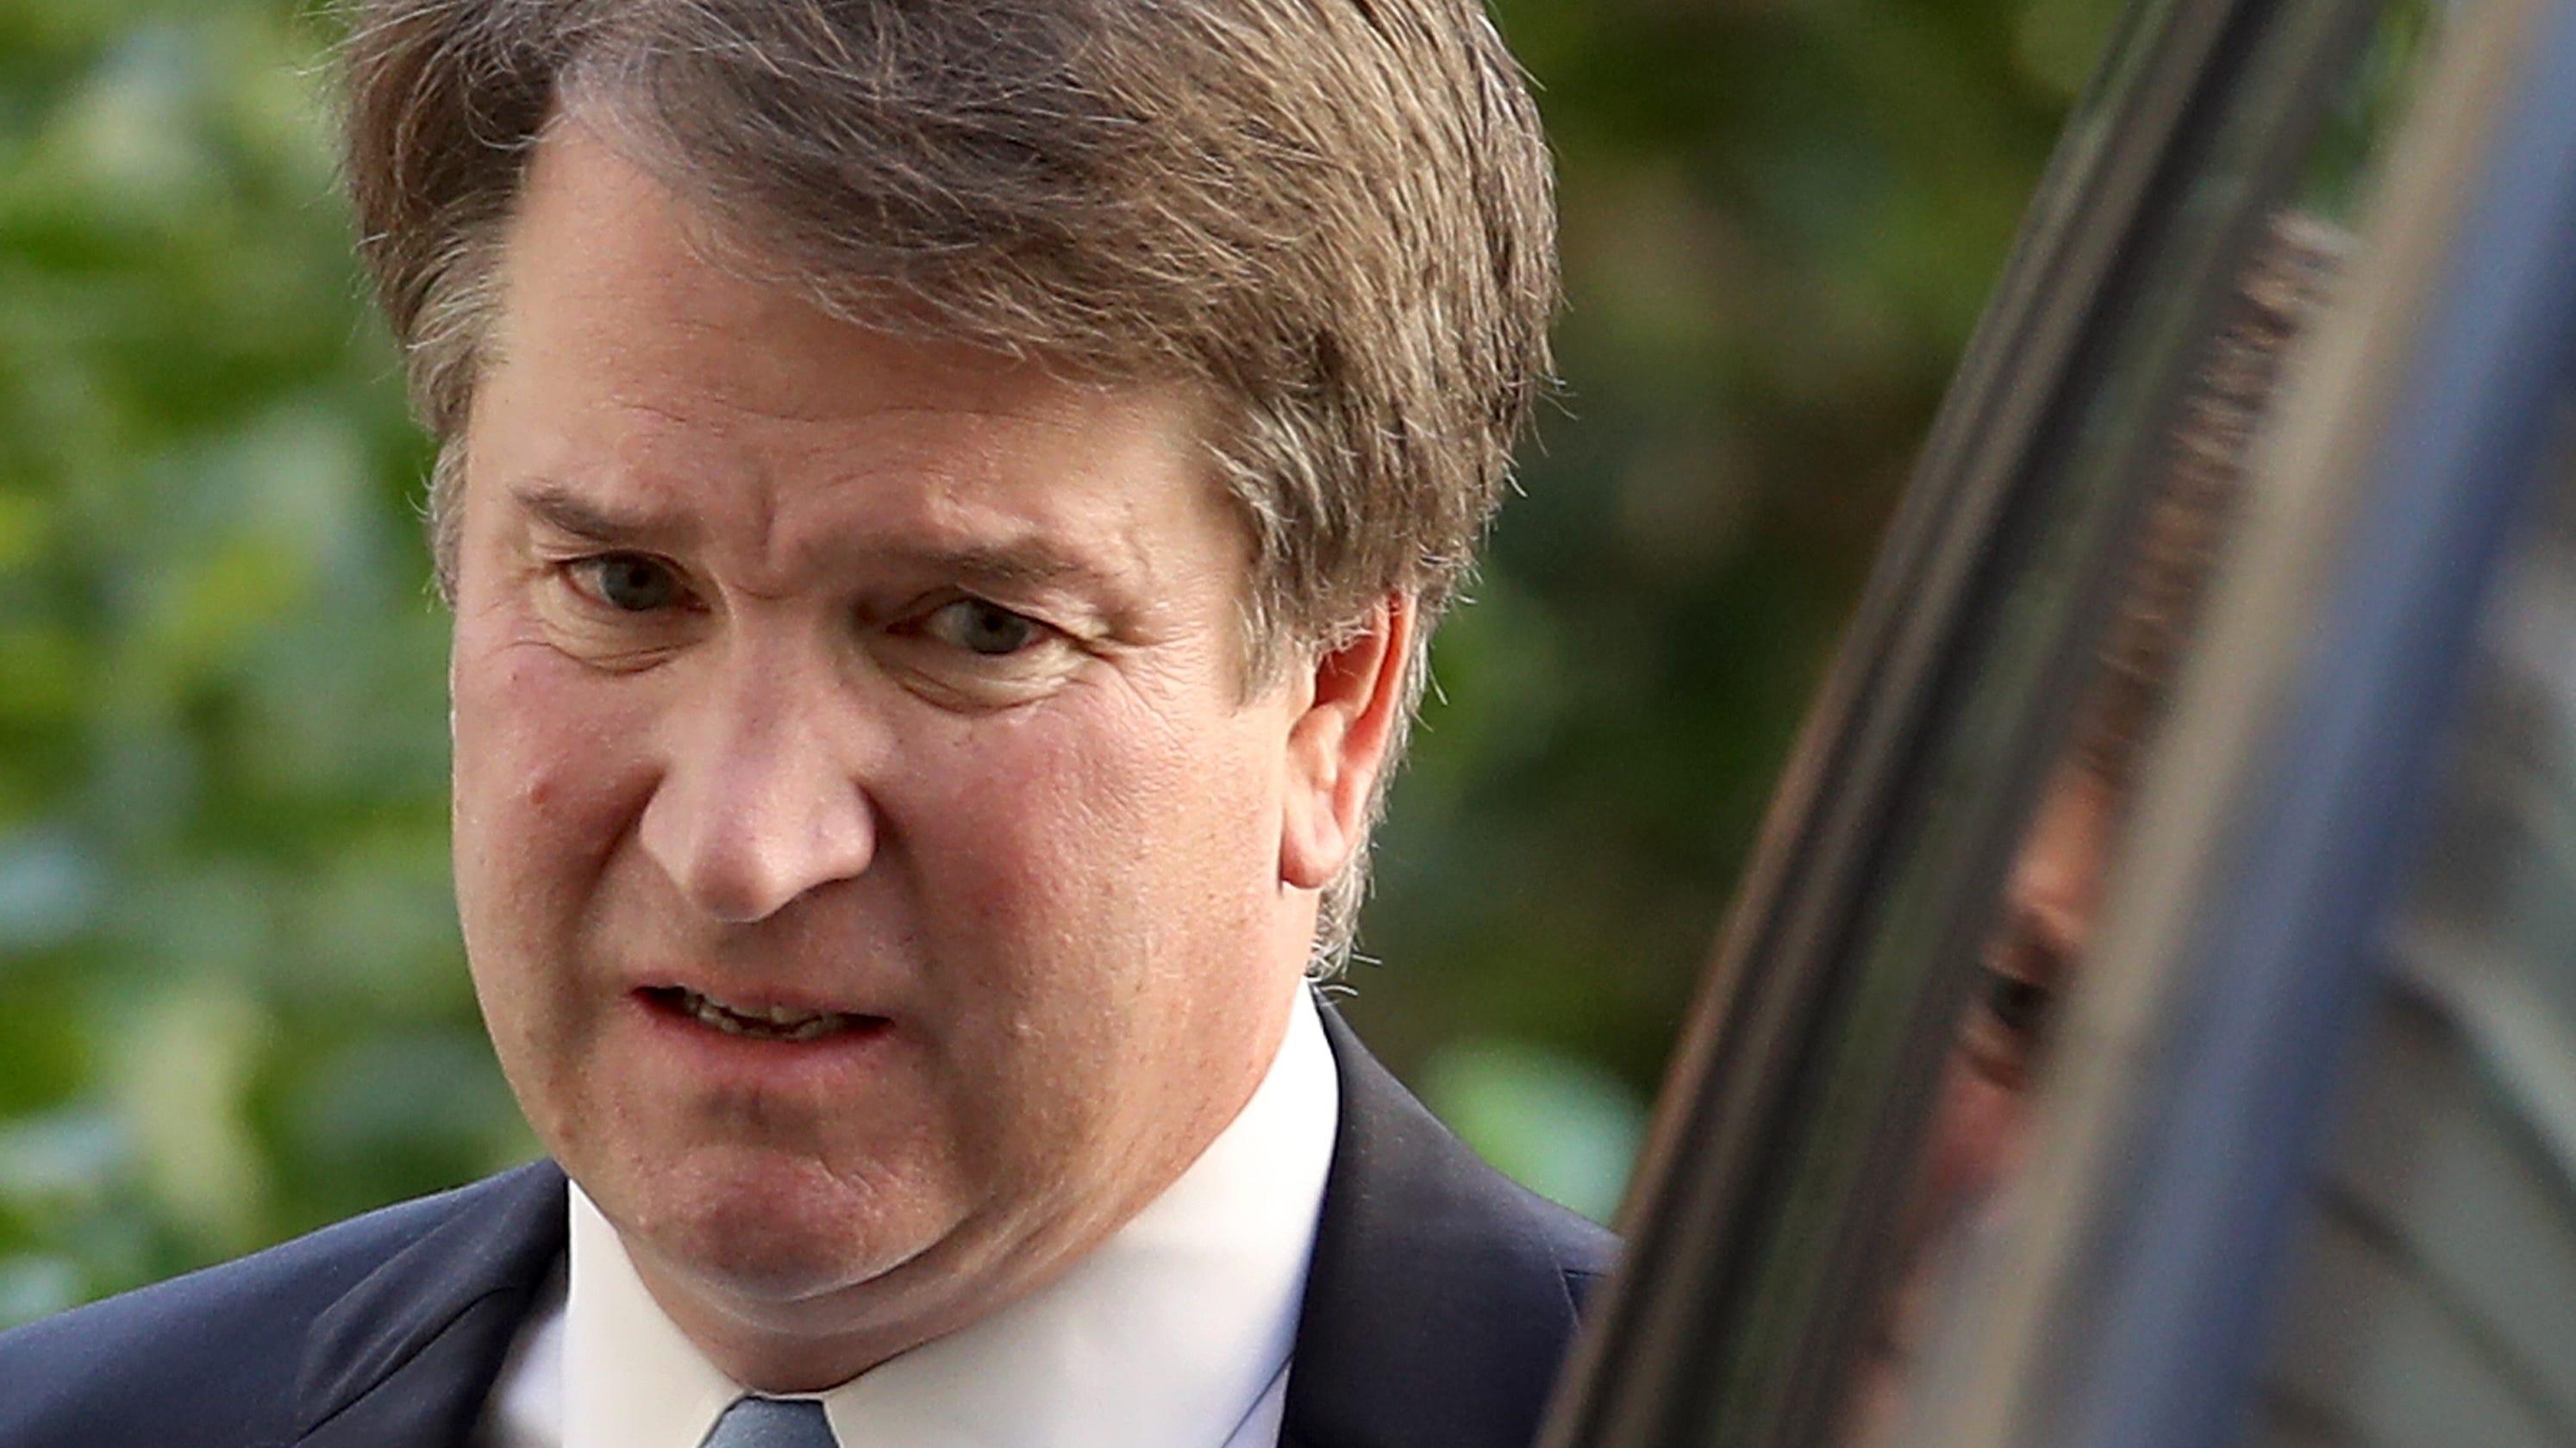 Senate panel quietly investigating Kavanaugh assault claims amid testimony negotiations